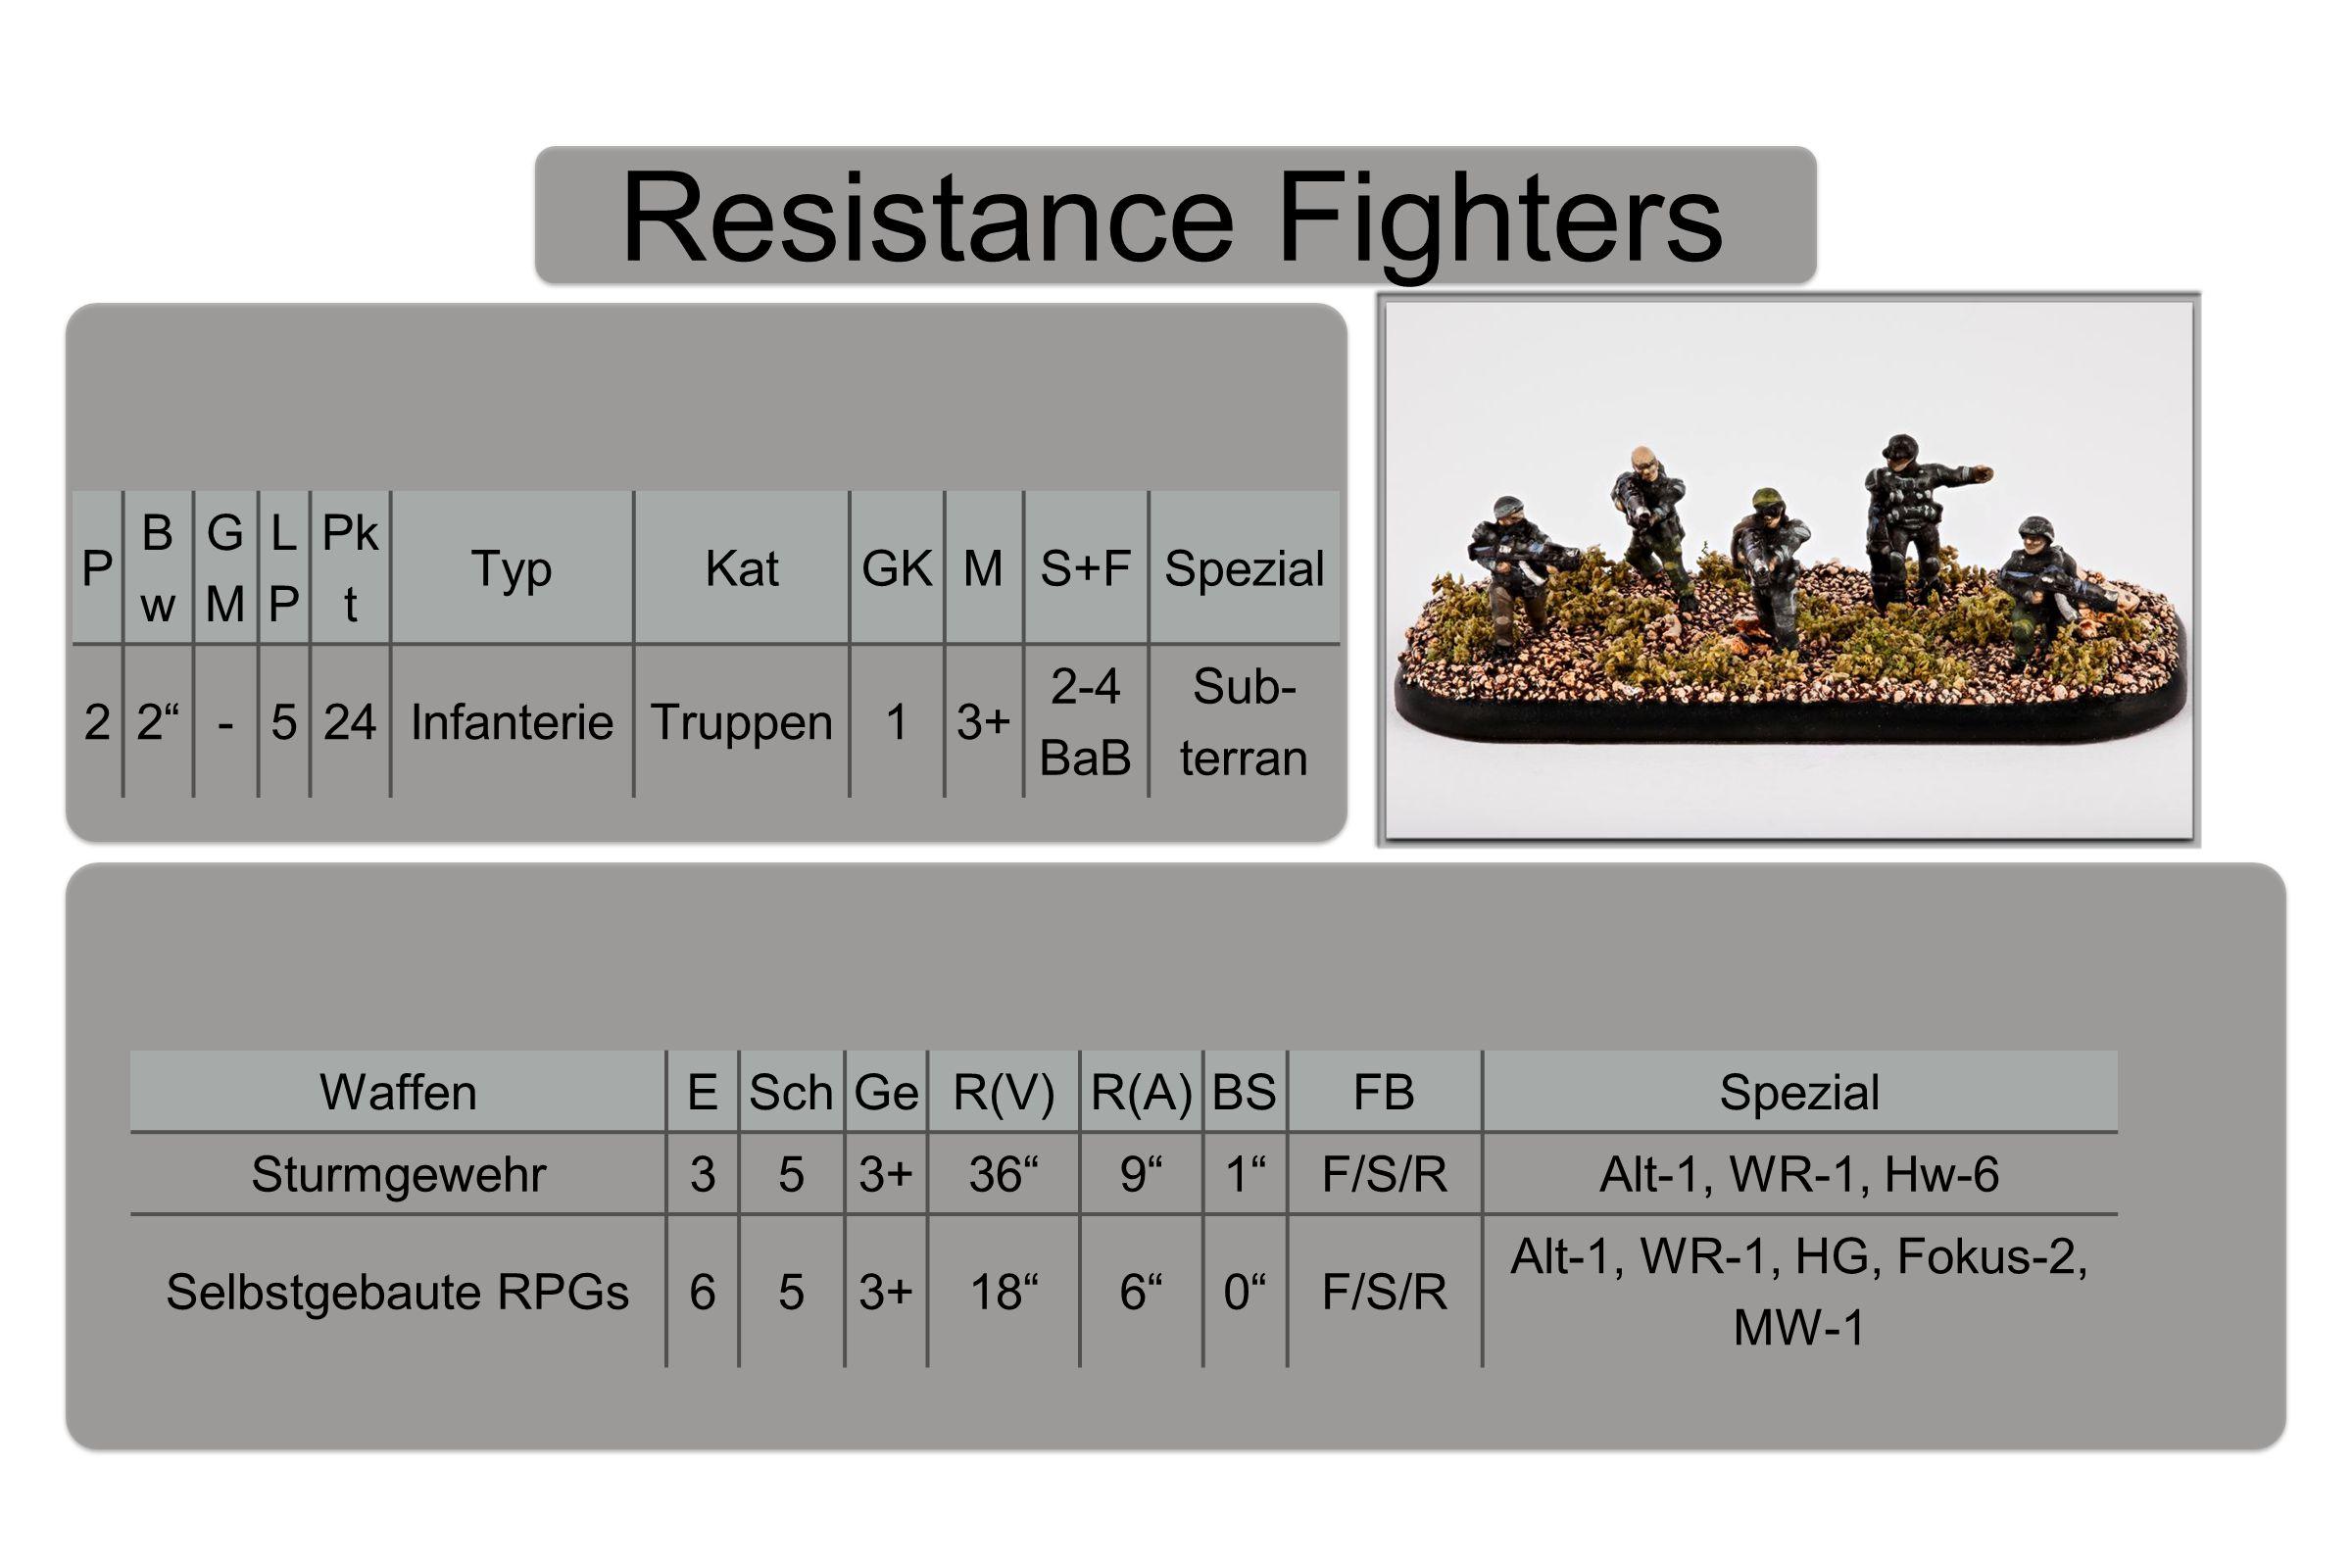 Resistance Fighters P BwBw GMGM LPLP Pk t TypKatGKMS+FSpezial 22 -524InfanterieTruppen13+ 2-4 BaB Sub- terran WaffenESchGeR(V)R(A)BSFBSpezial Sturmgewehr353+36 9 1 F/S/RAlt-1, WR-1, Hw-6 Selbstgebaute RPGs653+18 6 0 F/S/R Alt-1, WR-1, HG, Fokus-2, MW-1